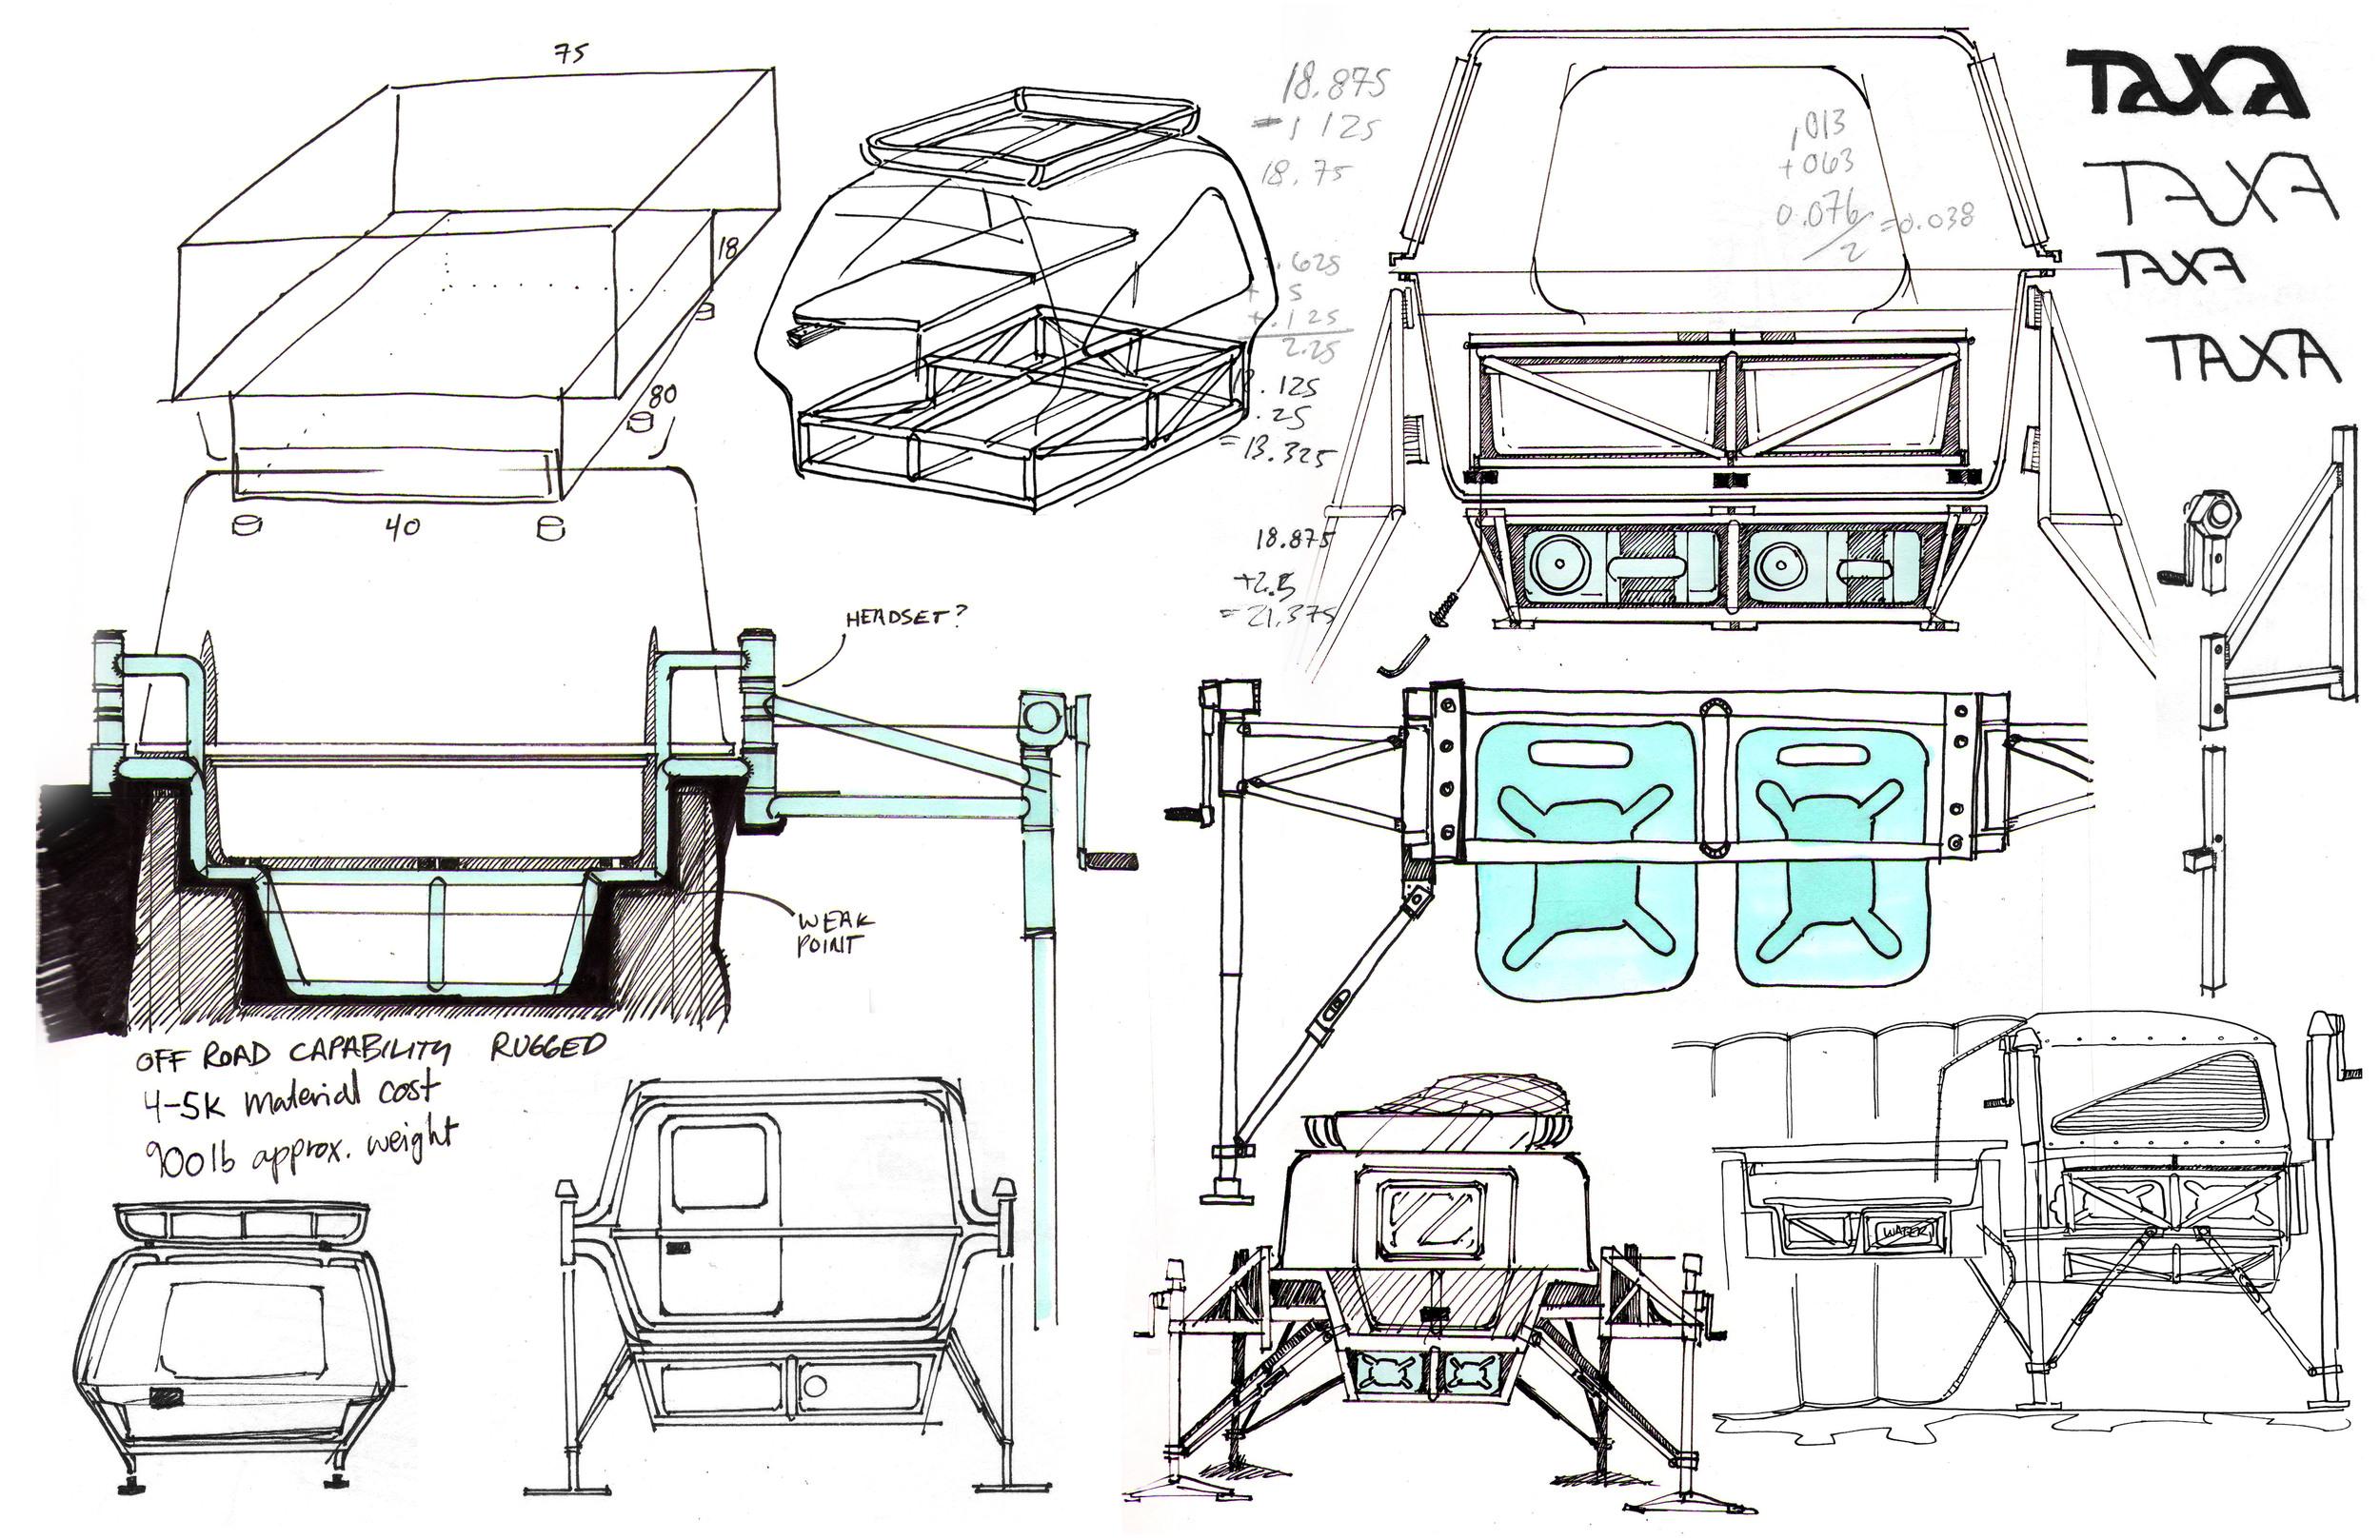 HFT_Drawings_DEC.jpg